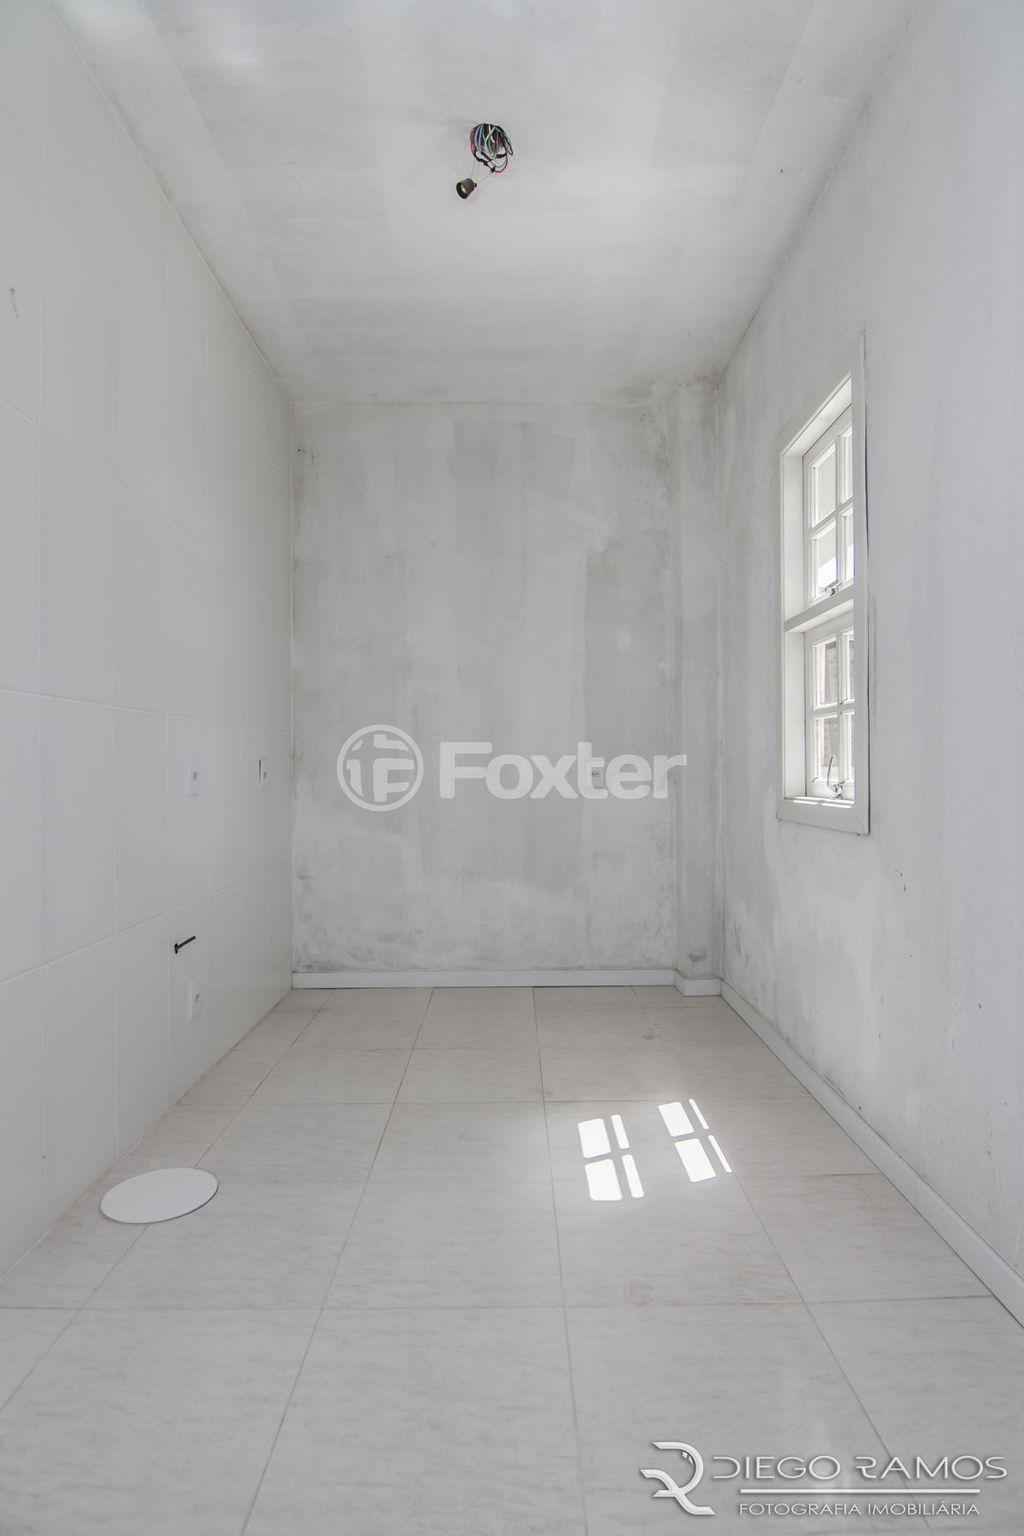 Casa 2 Dorm, Aberta dos Morros, Porto Alegre (118259) - Foto 7